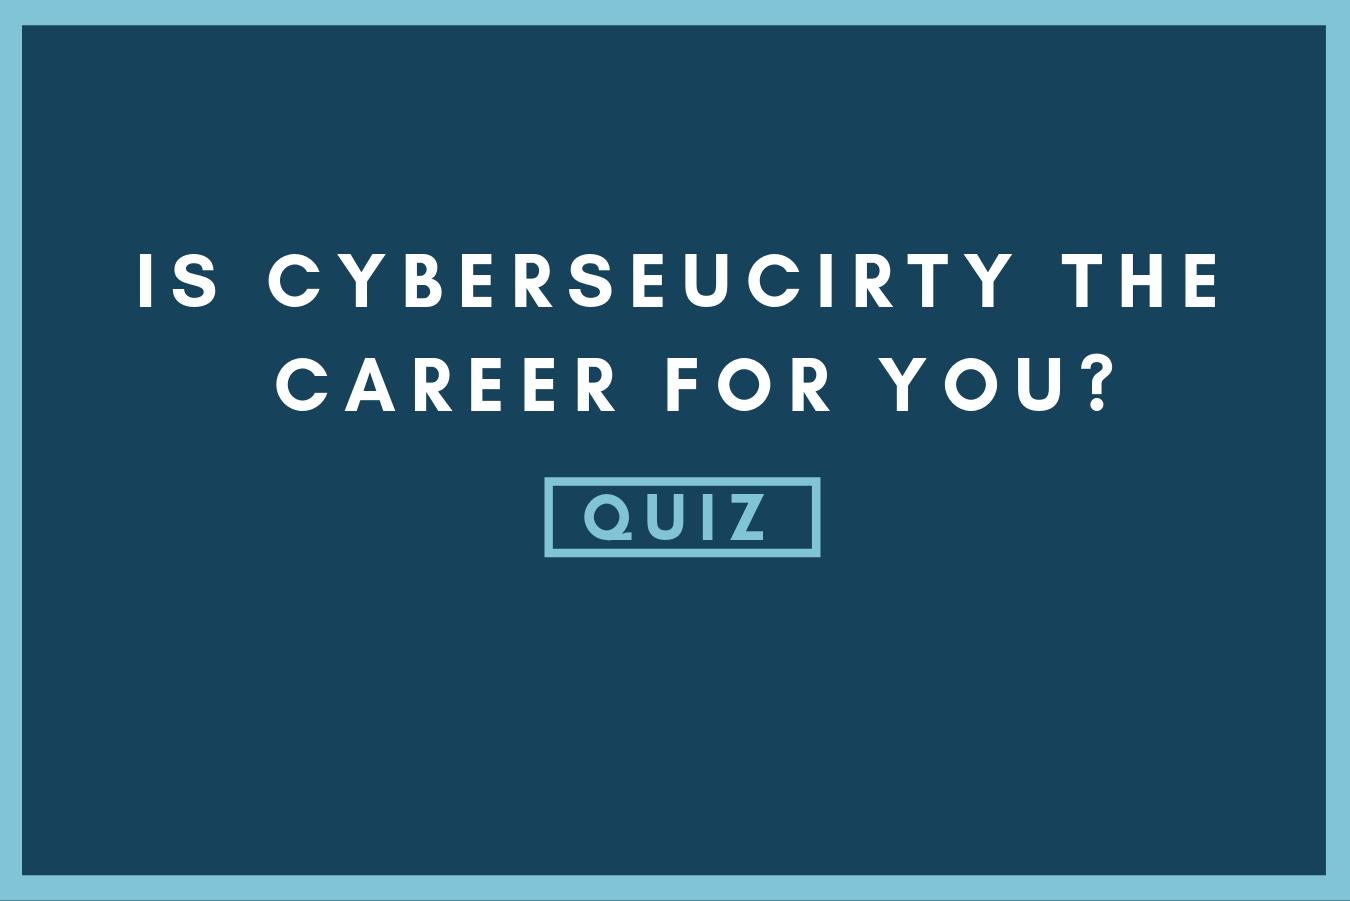 Free Career Guide - CyberInternAcademy